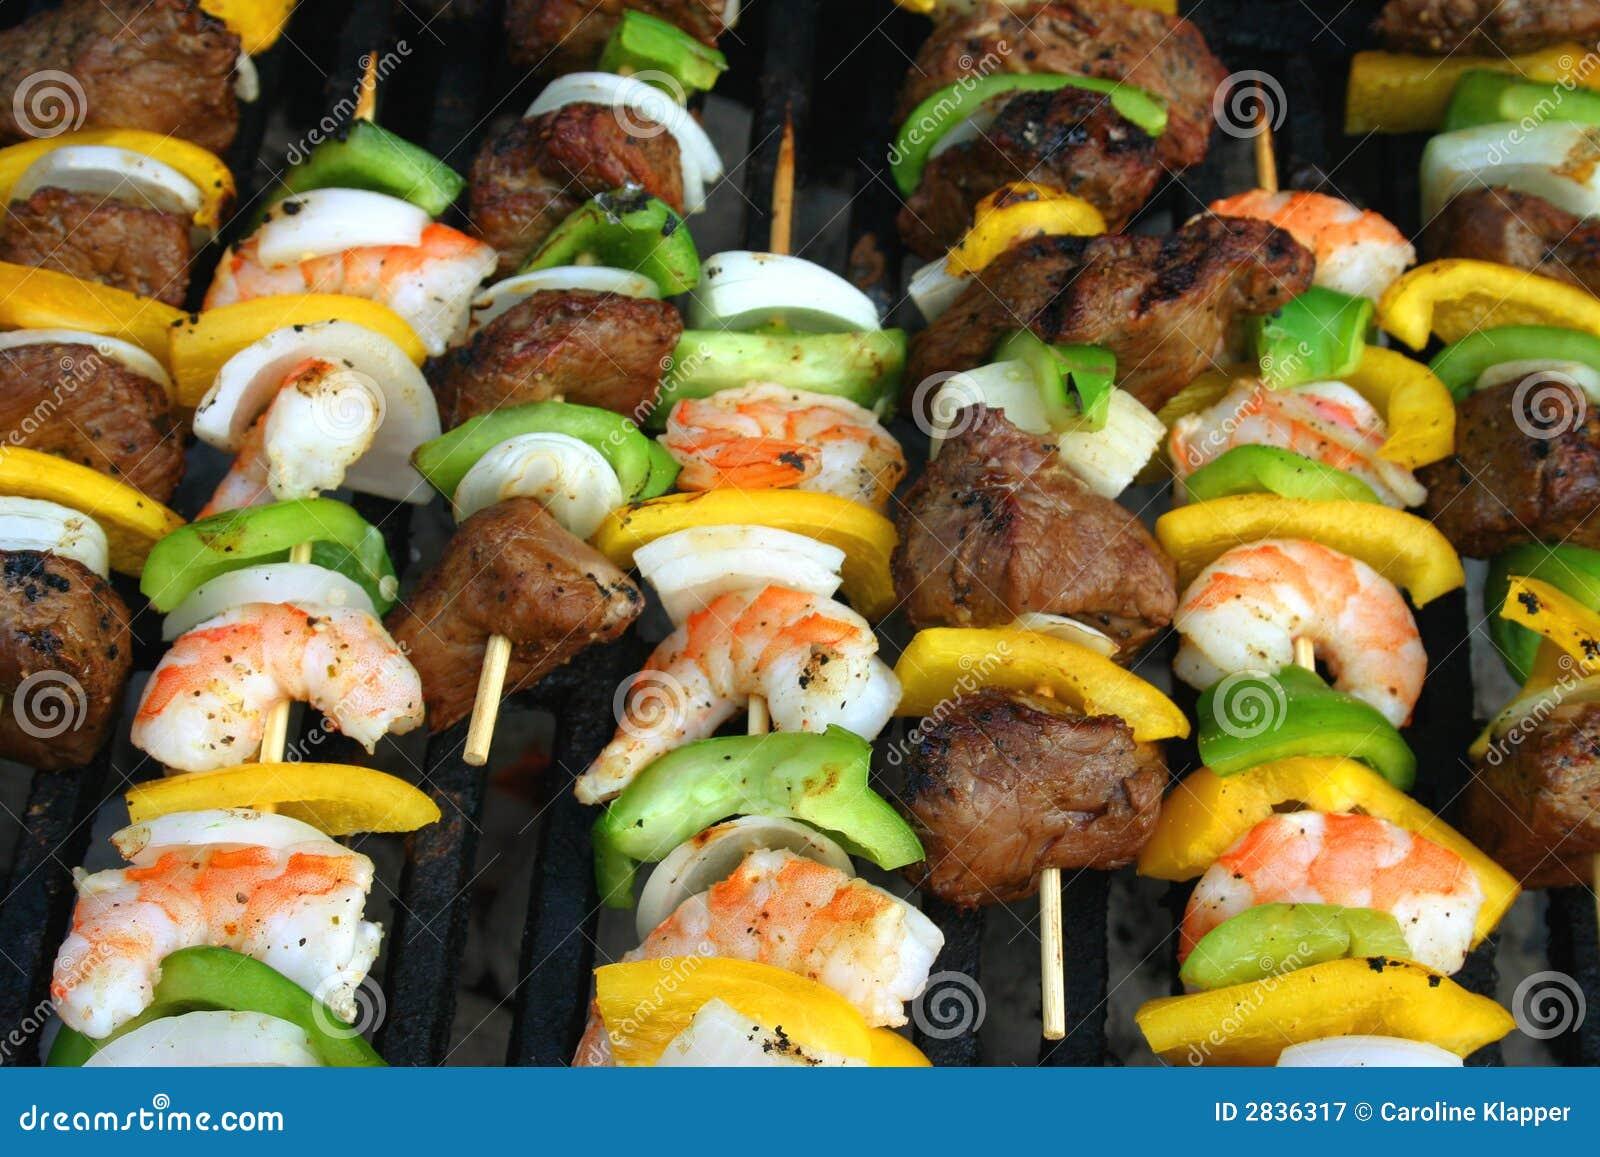 recipe: easy steak and shrimp kabobs [39]